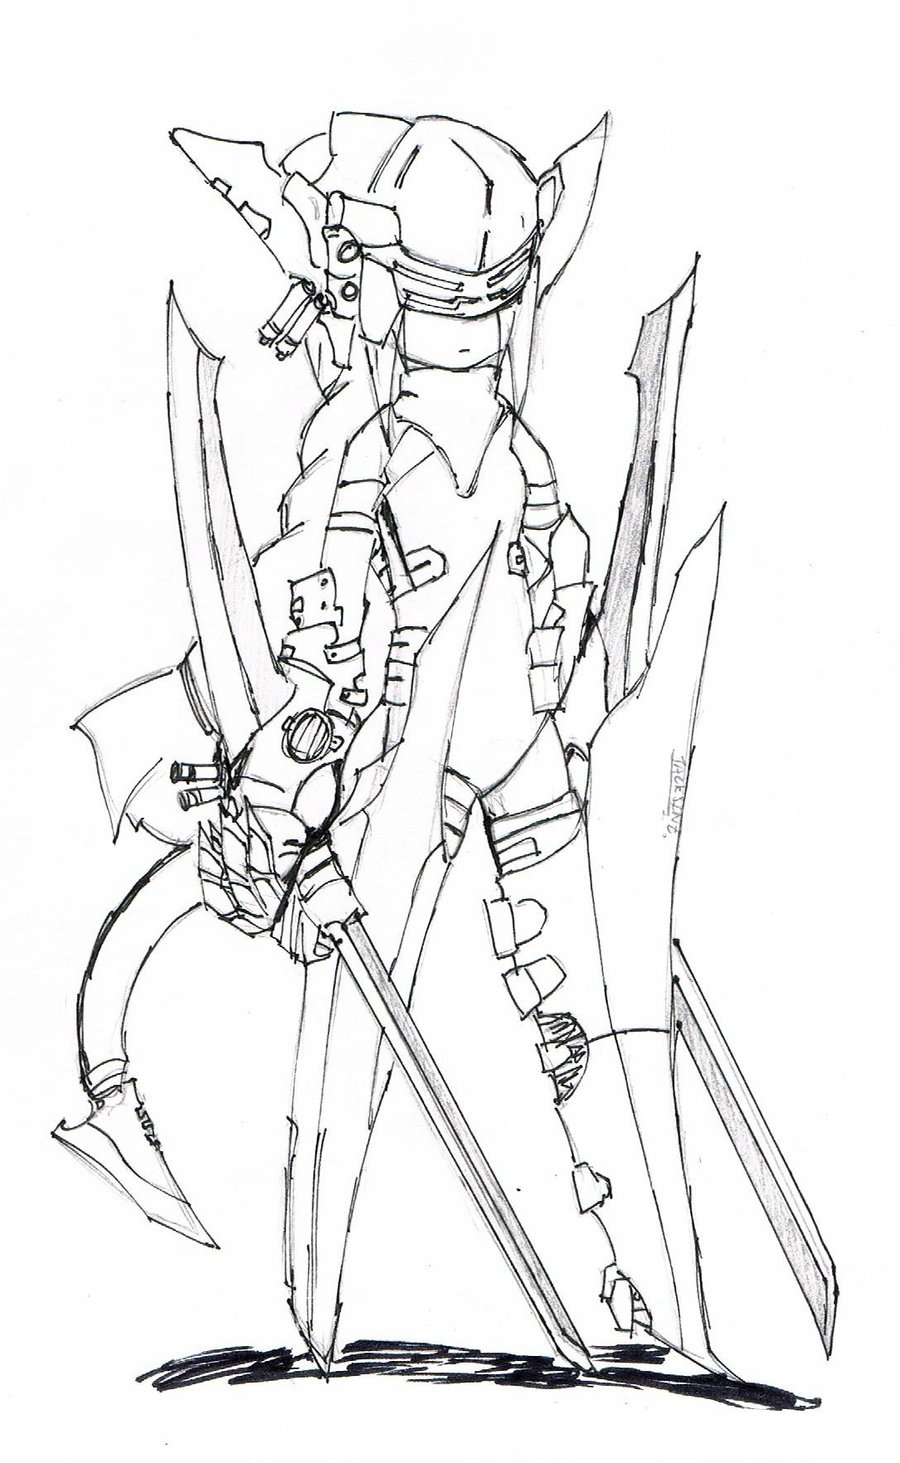 Drawn samurai robot samurai By Robot by on JackSinz